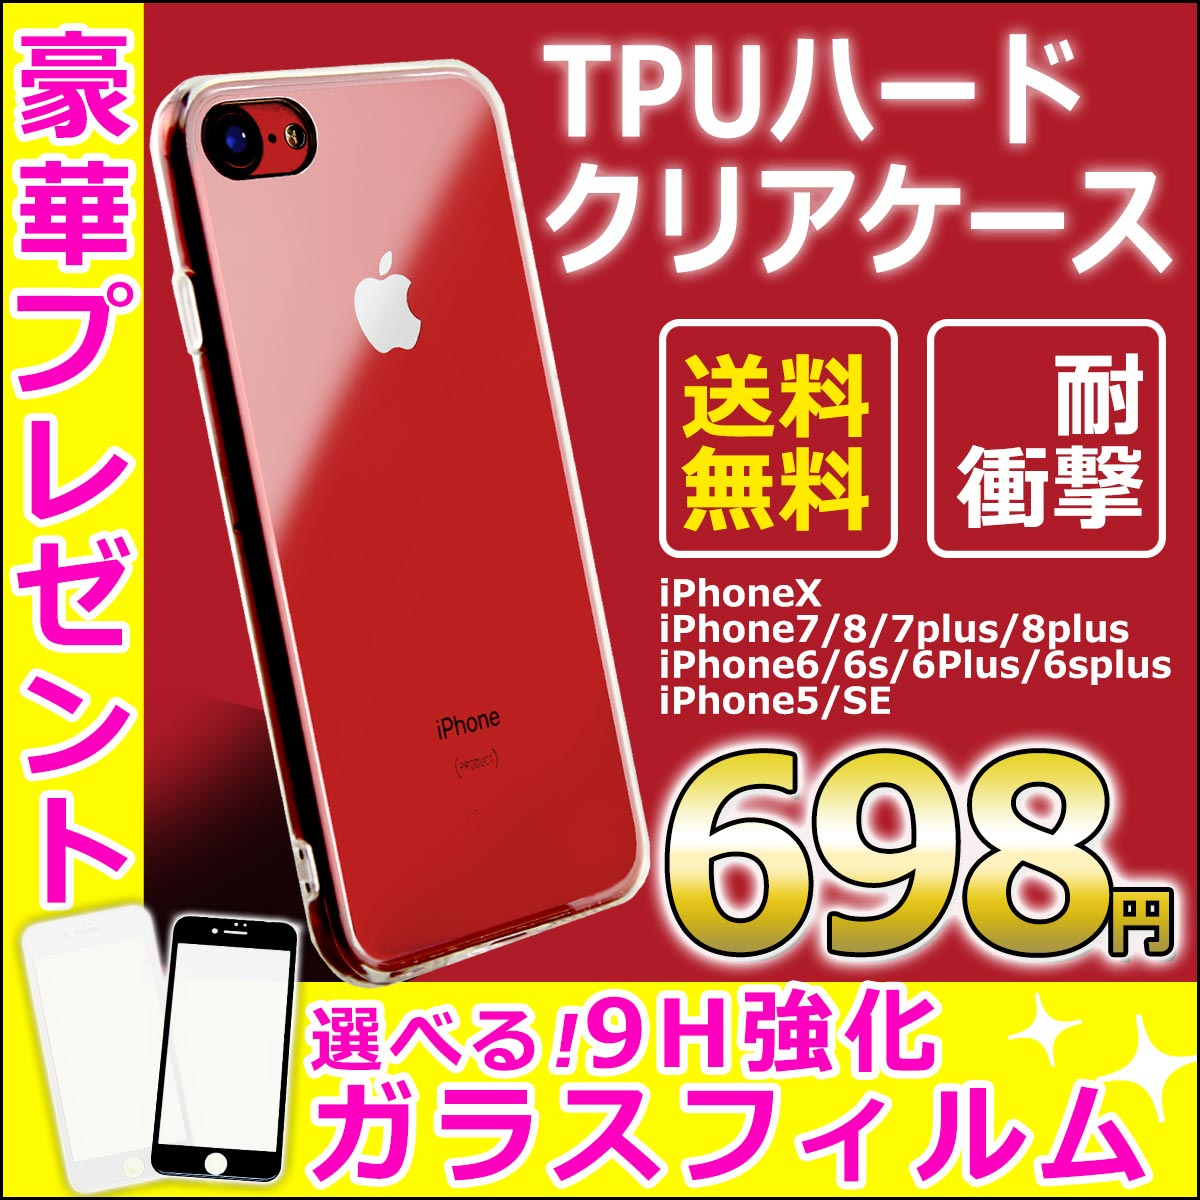 iphoneX iPhoneXsケース iphone8 iPhone se Galaxy s8 s9【耐衝撃】tpu+pc【超クリア ケース】ハードケース【送料無料】 iPhone6 Plus